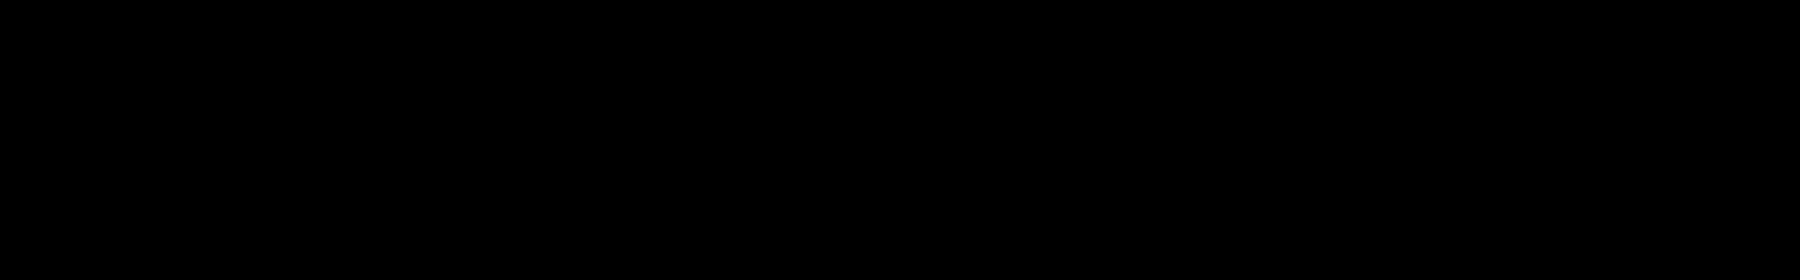 Synthetic audio waveform